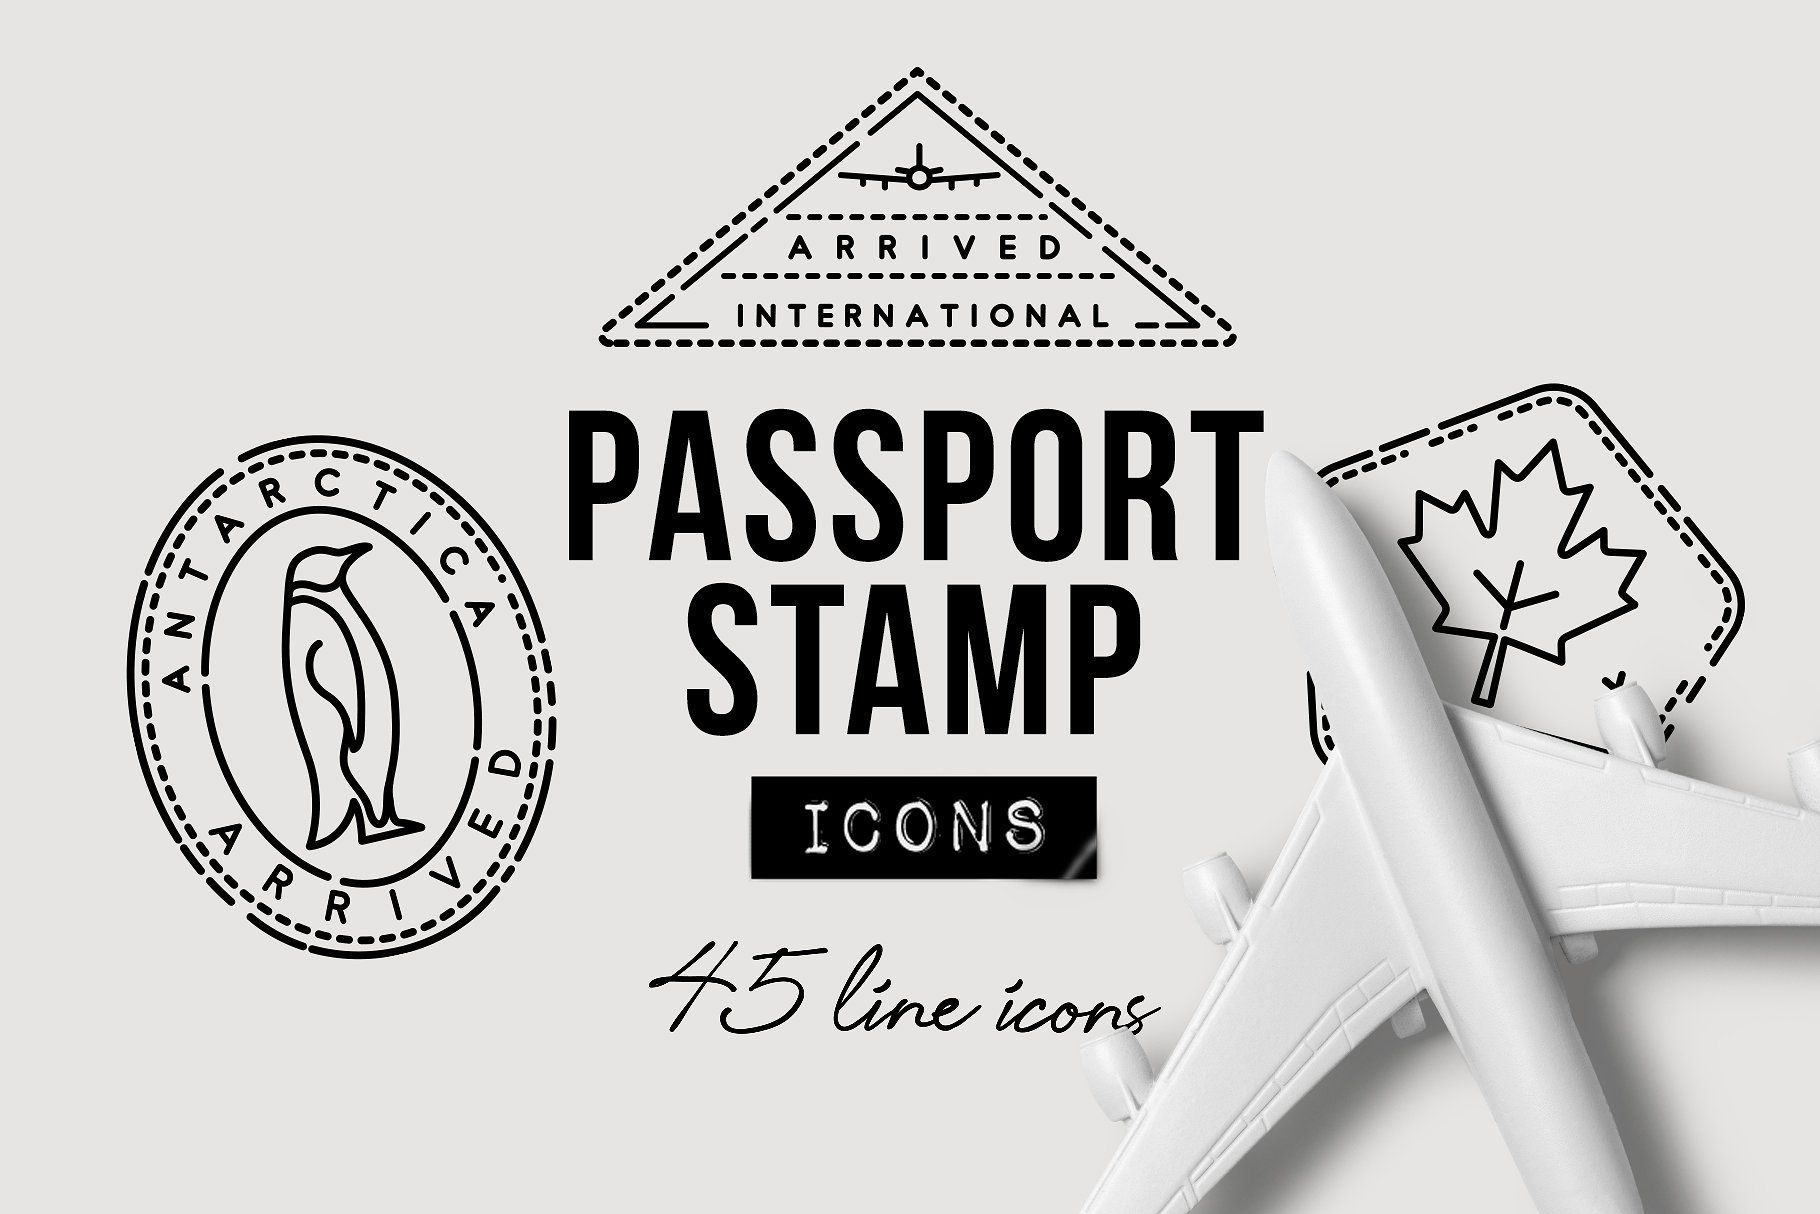 45 Passport Stamp Icons Travel Website Symbol Passport Stamps